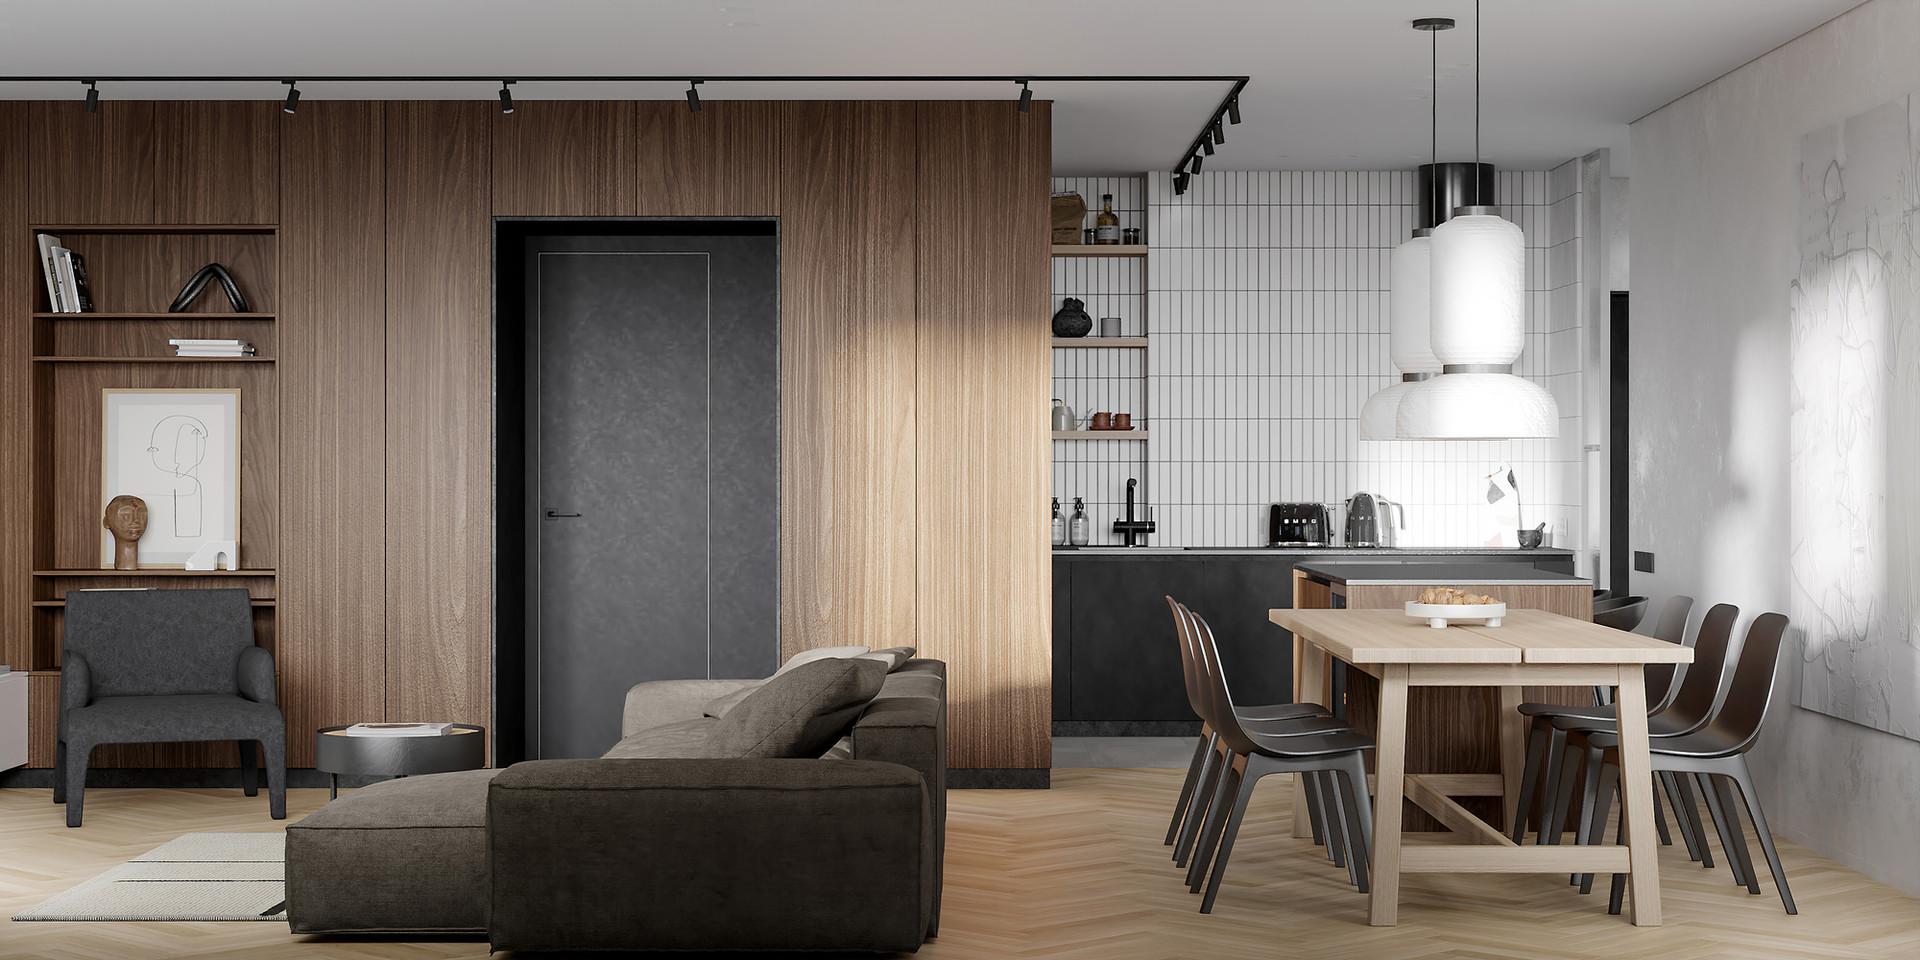 design interior SHUBOCHKINI architects SIA дизайн интерьераg